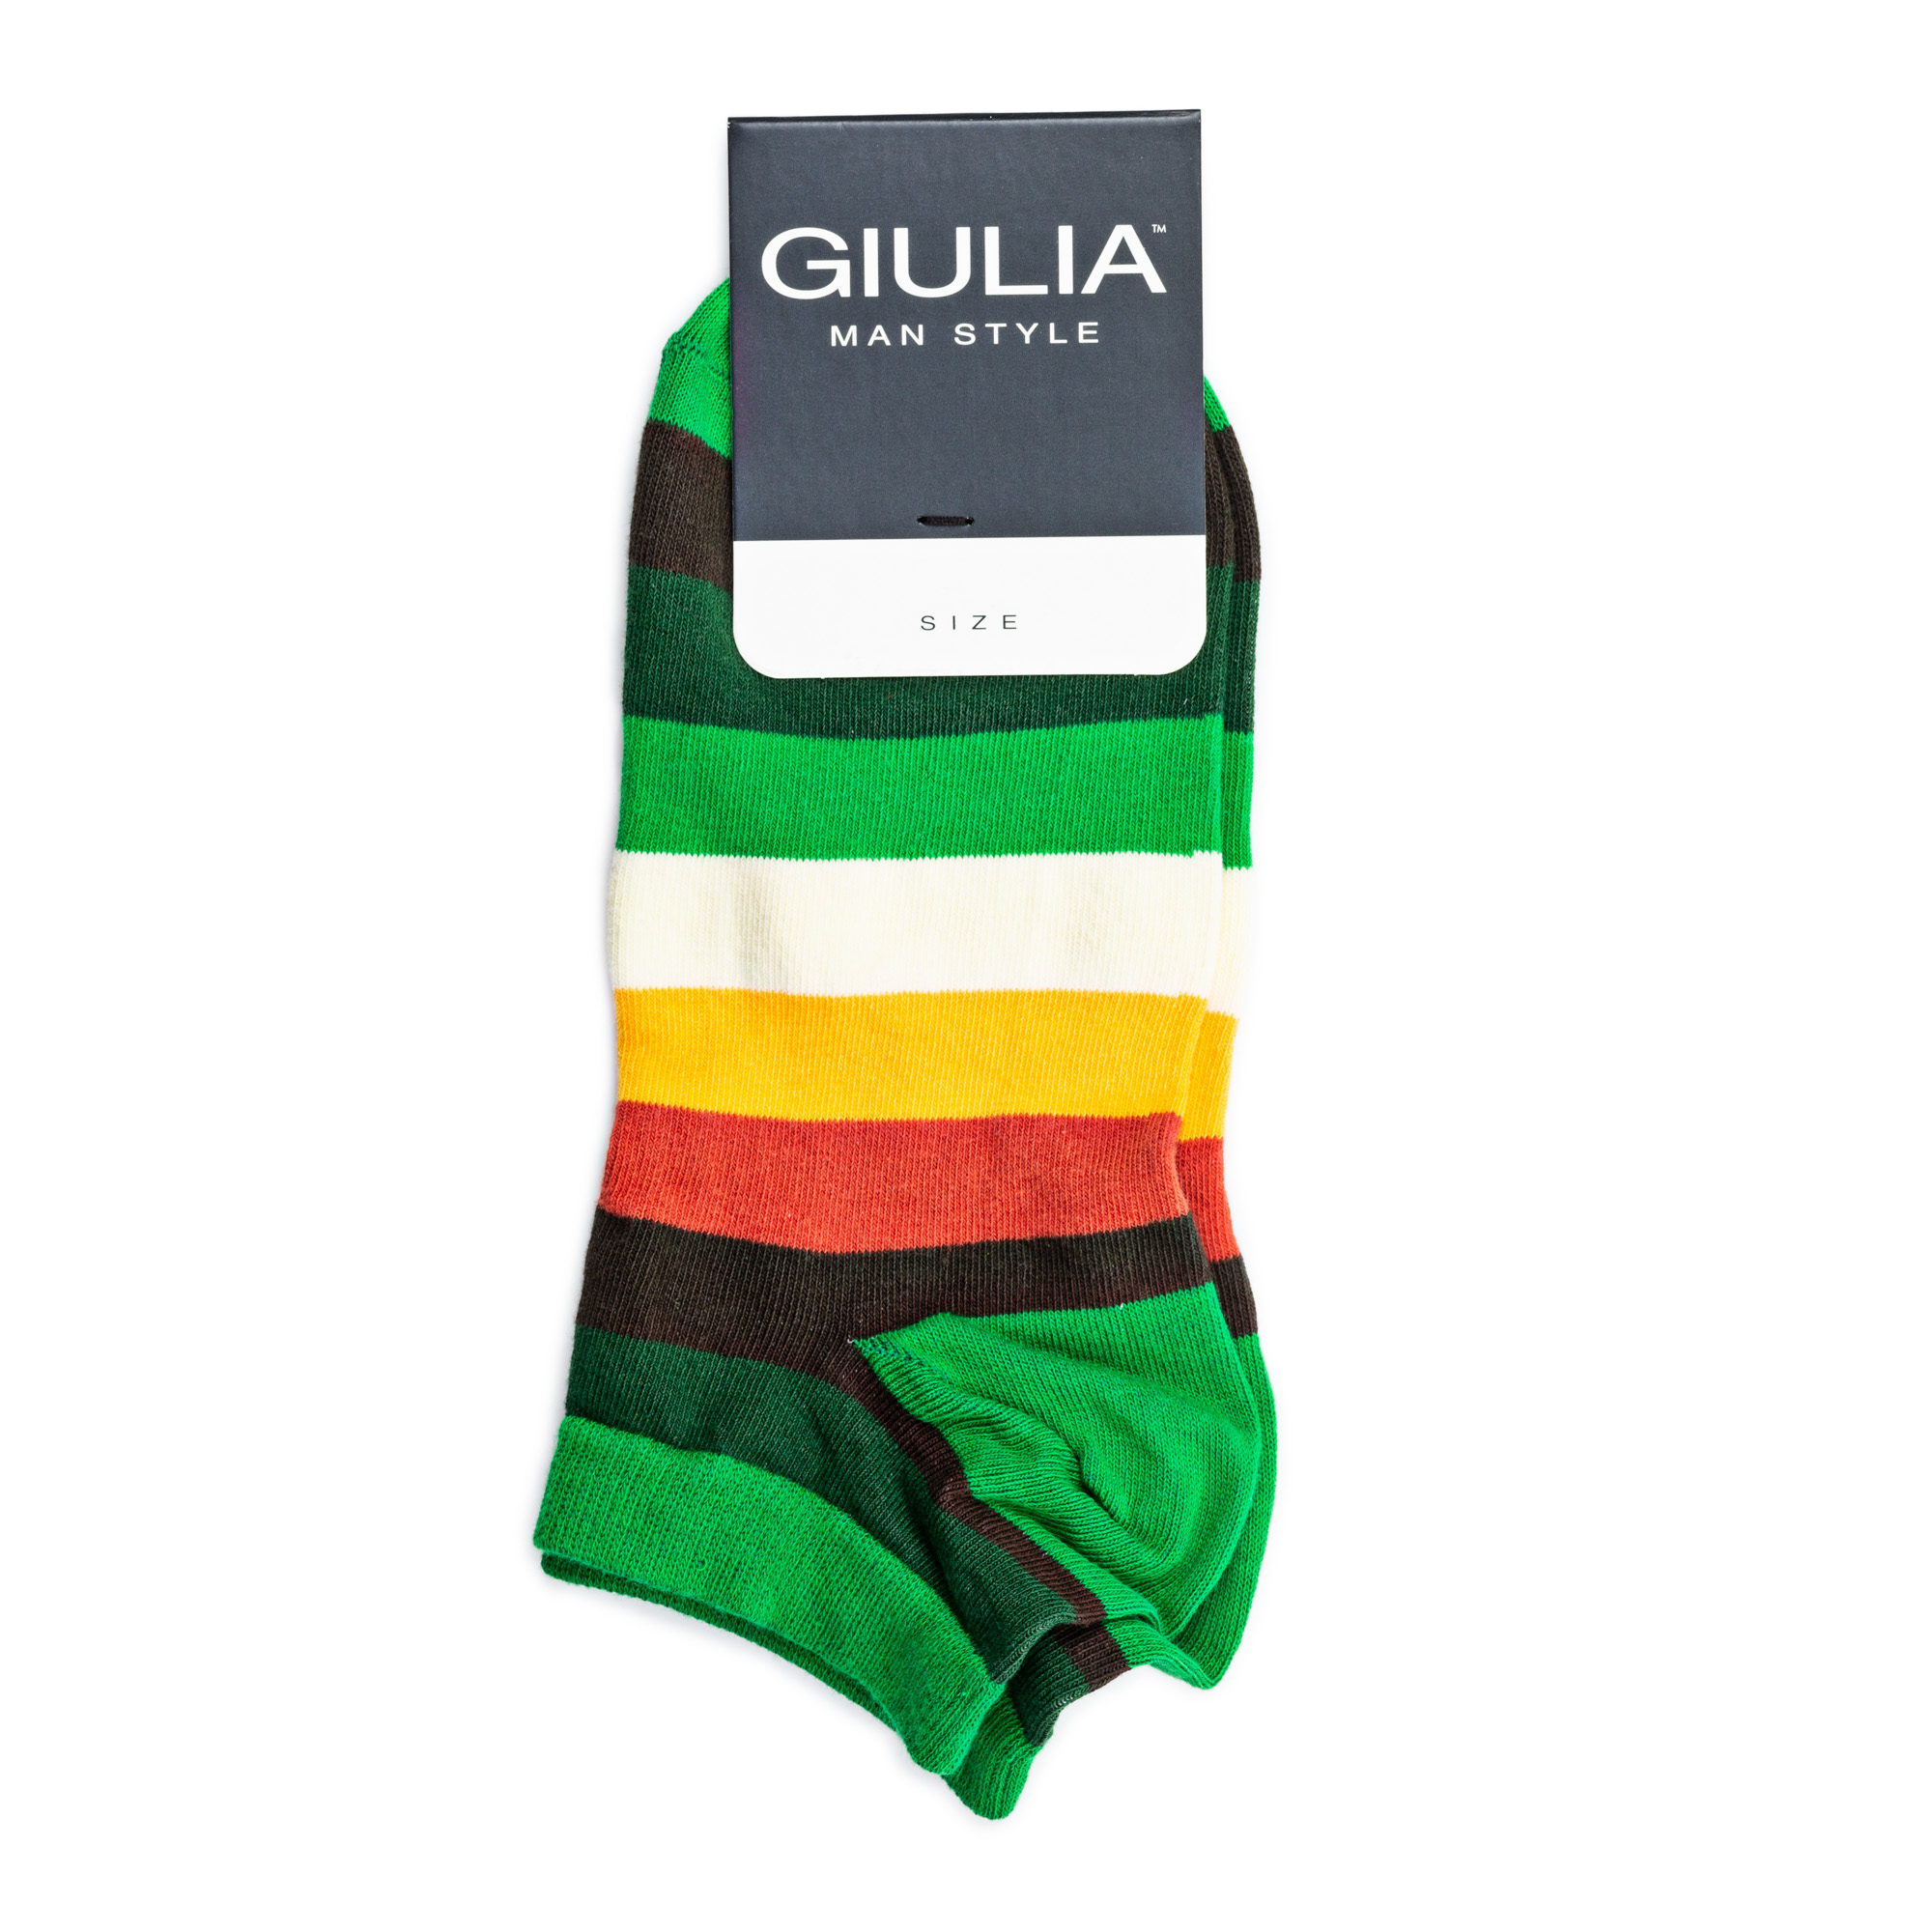 Носки мужские GIULIA MSS-001 calzino green р.41-42